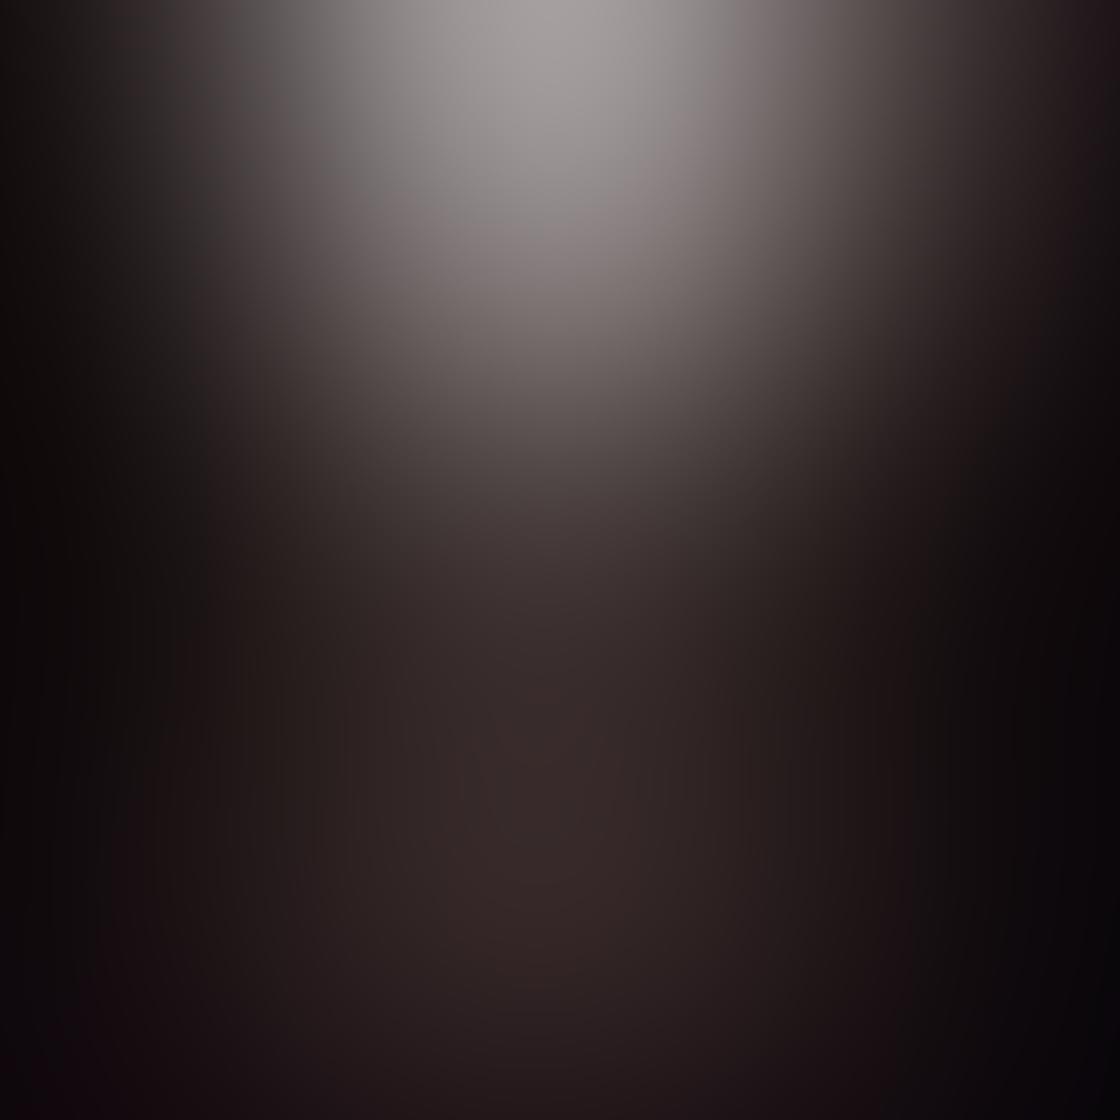 iPhone Photos Low Angle 15